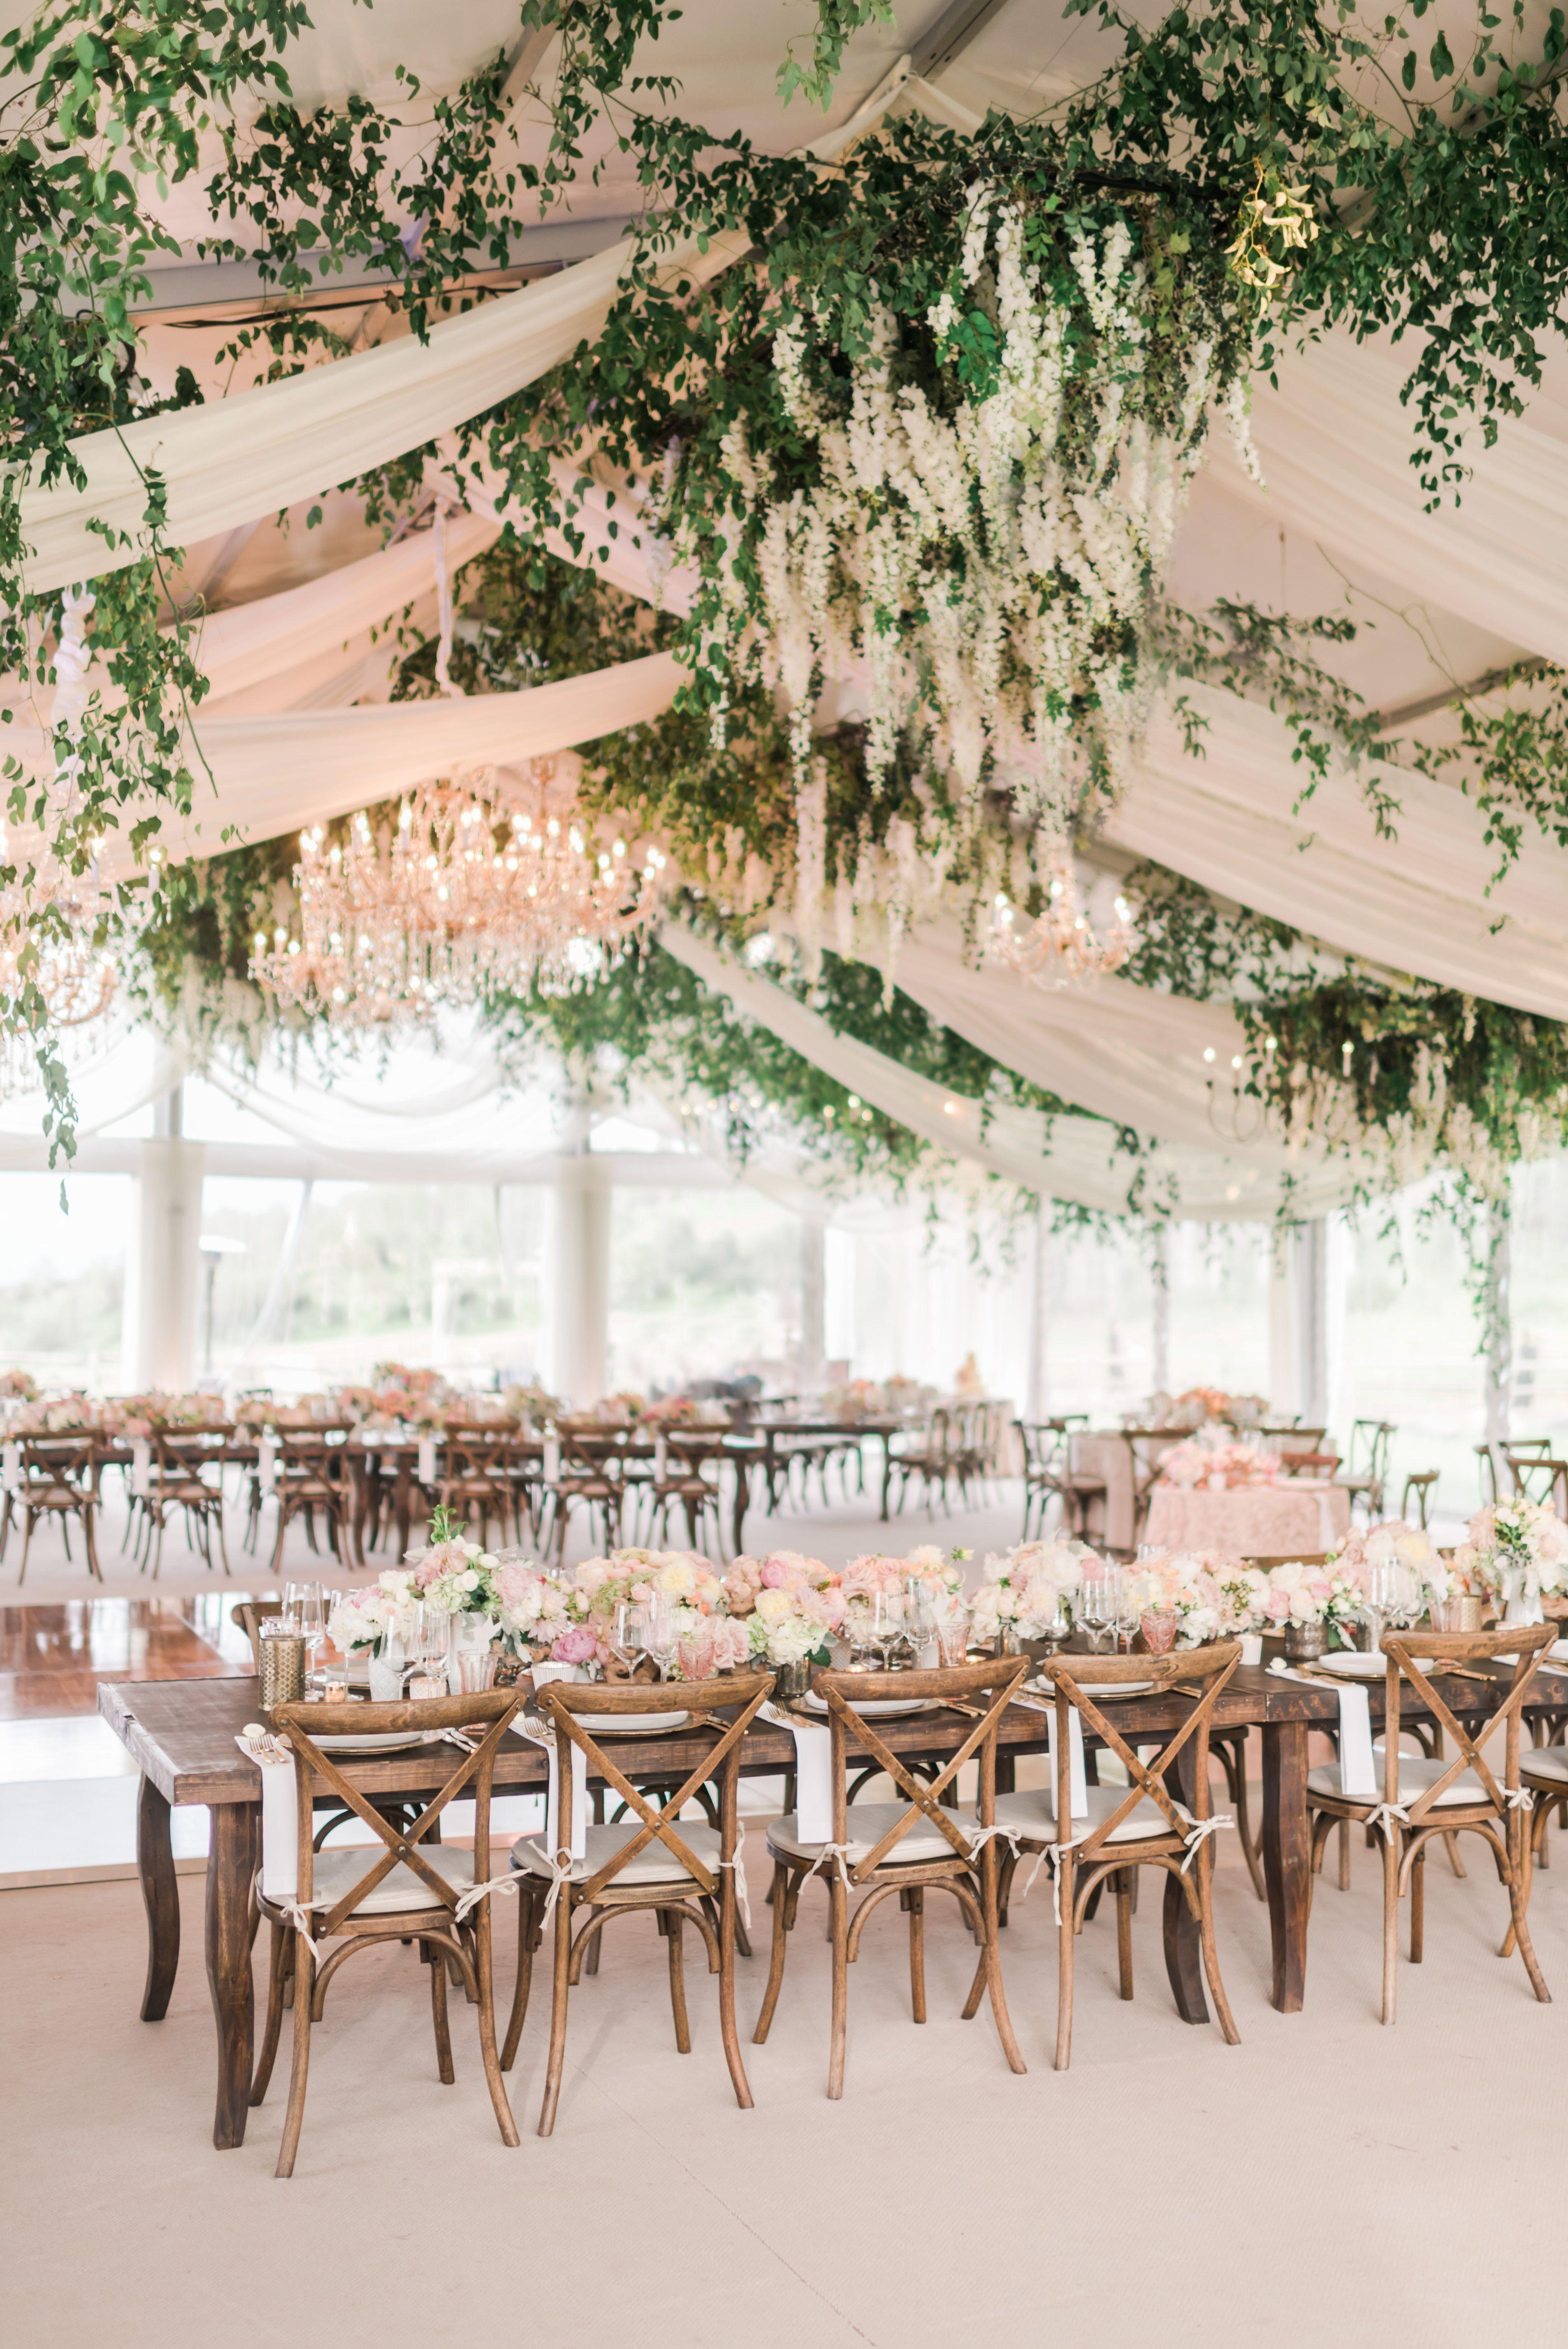 Empfangszelt mit Cascading Flowers, Draping und Crystal Chandeliers   – Wedding